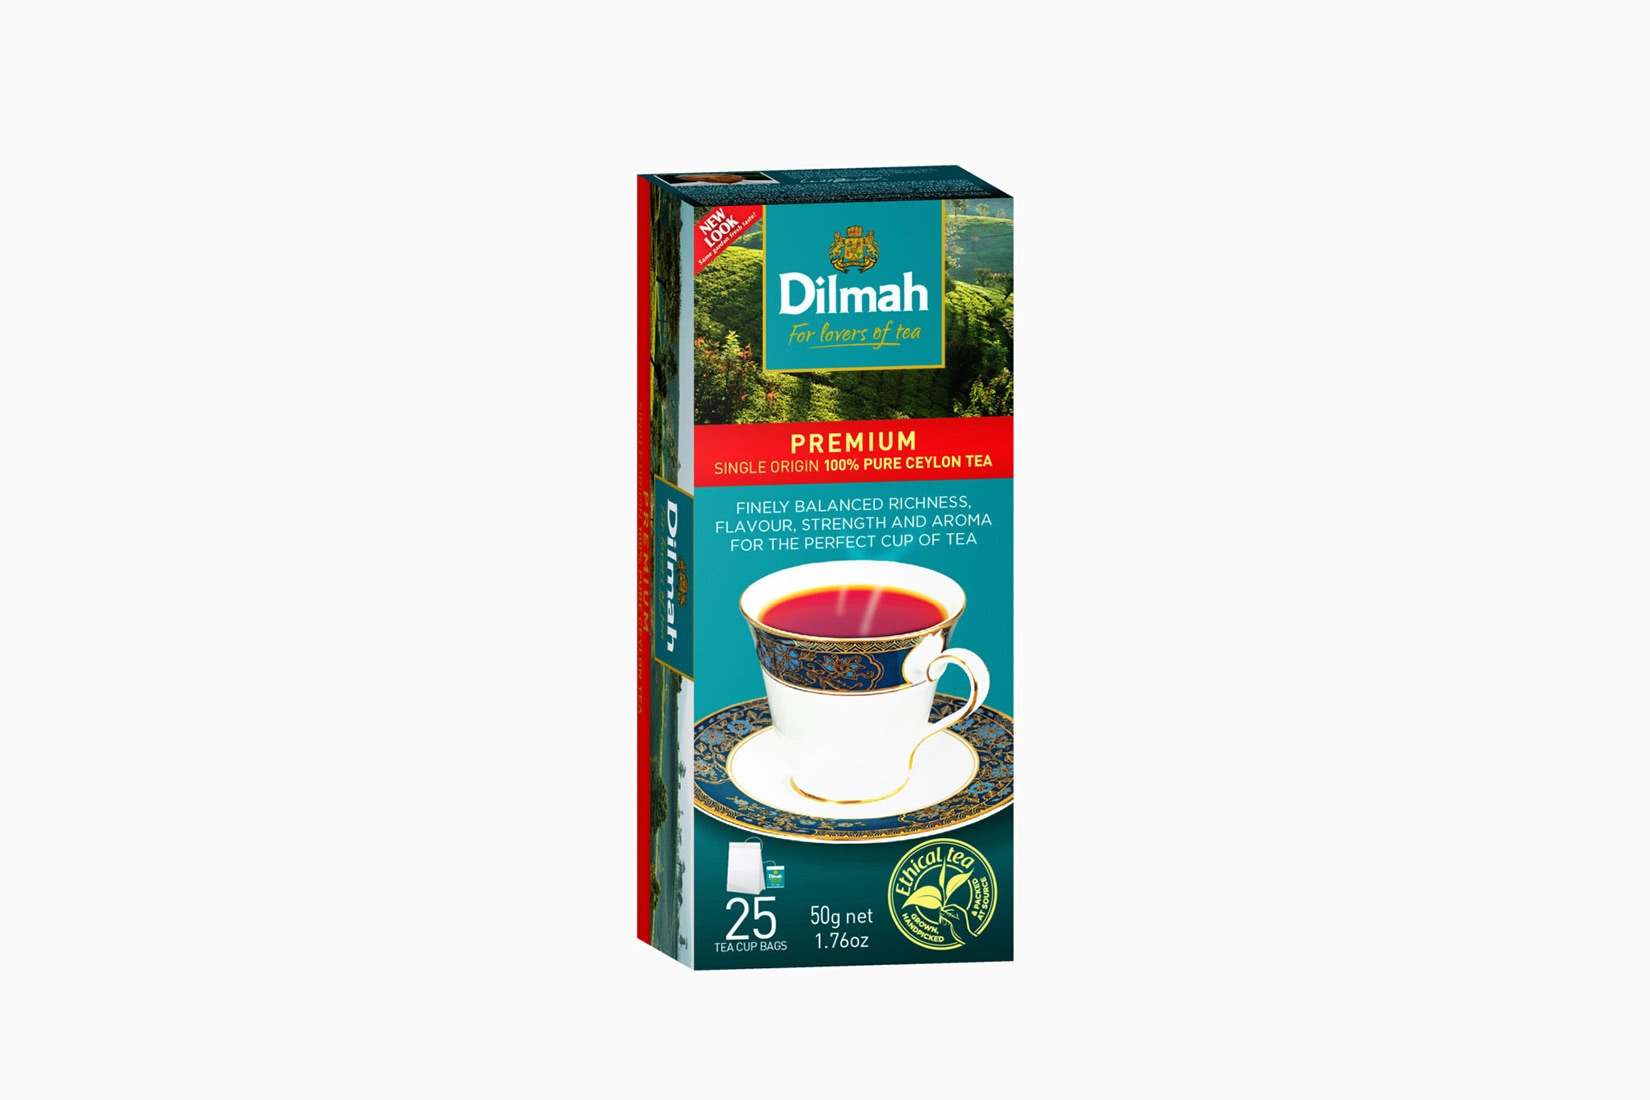 best tea brands dilmah premium ceylon - Luxe Digital